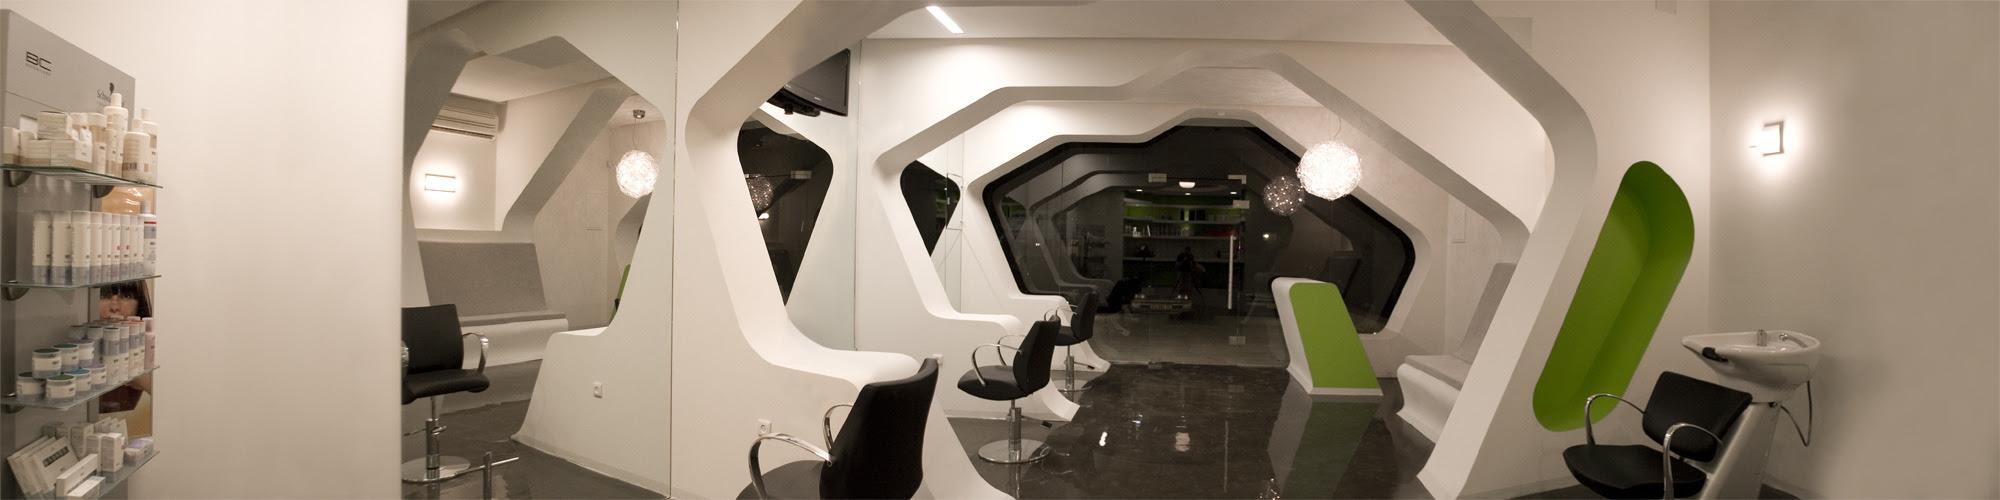 Barber Shop / Lior Vaknin & Sabi Aroch   ArchDaily